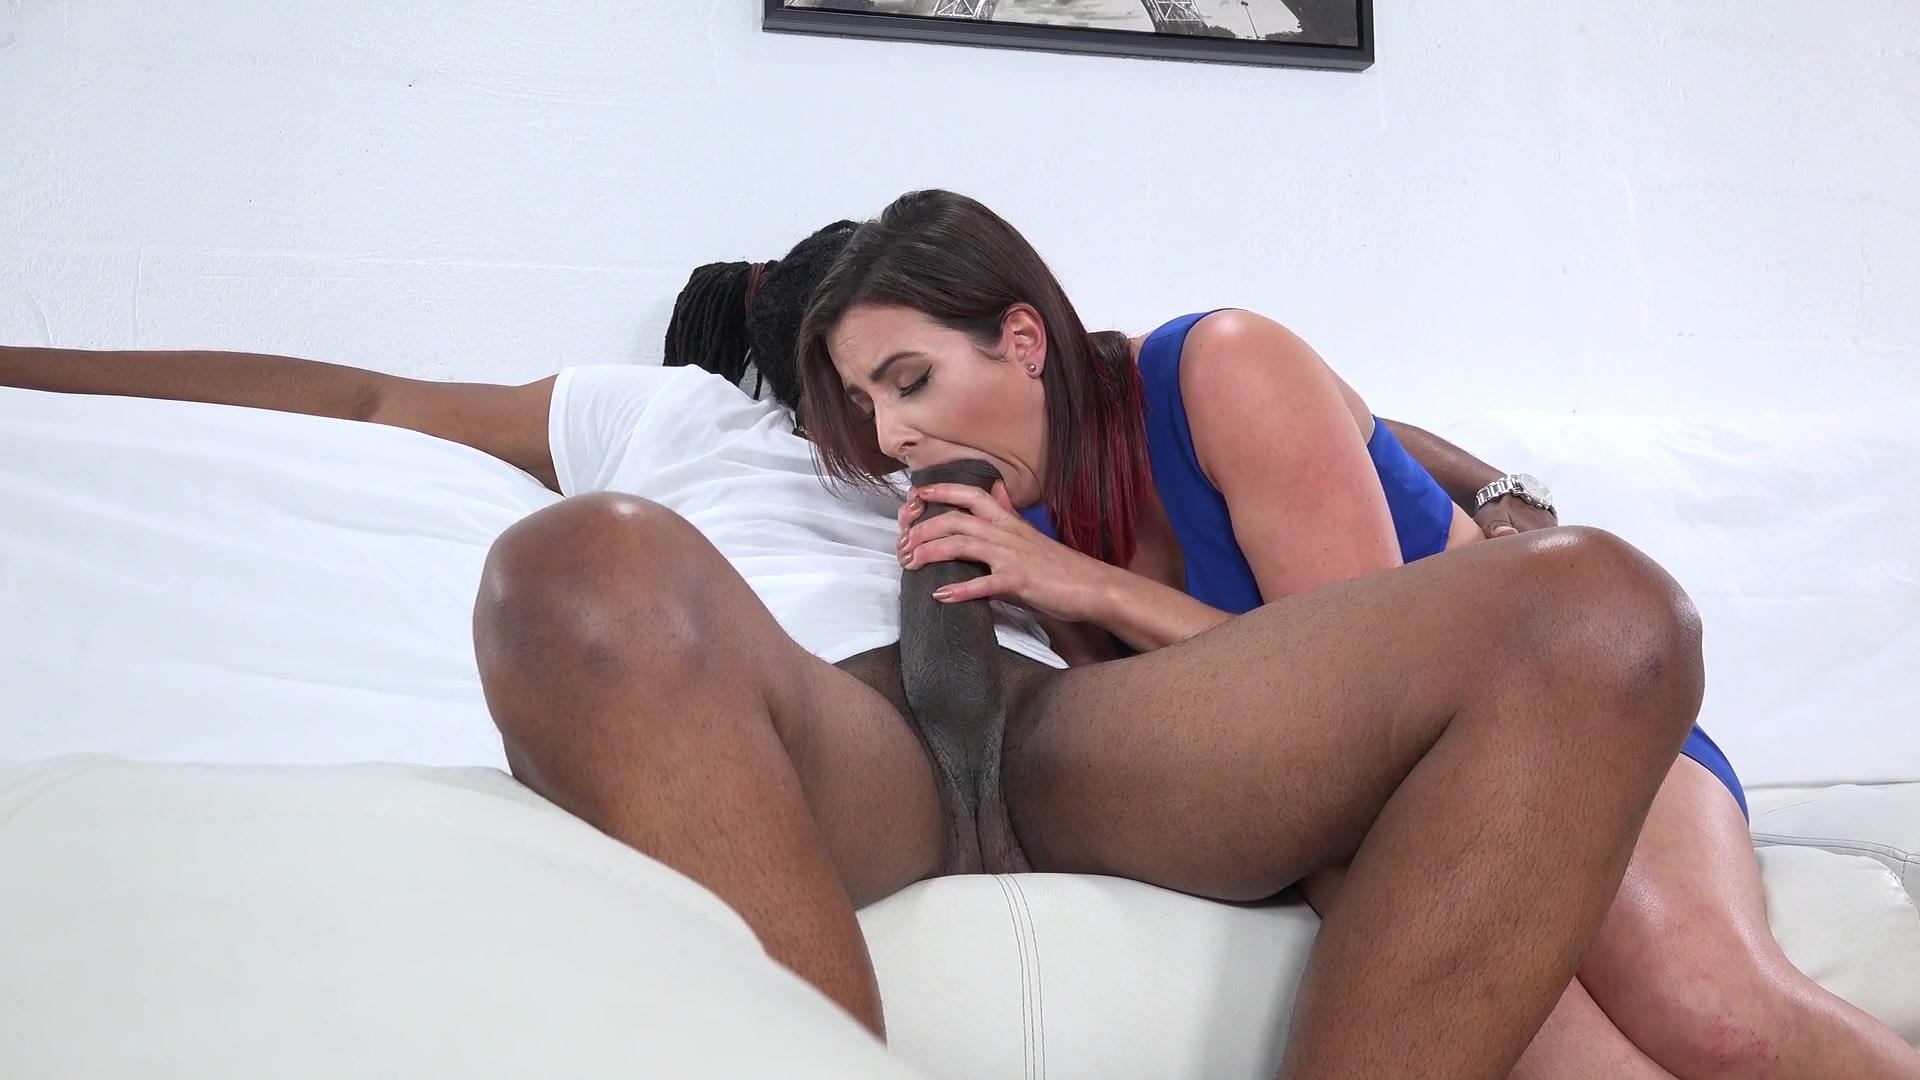 Pornos für lesben